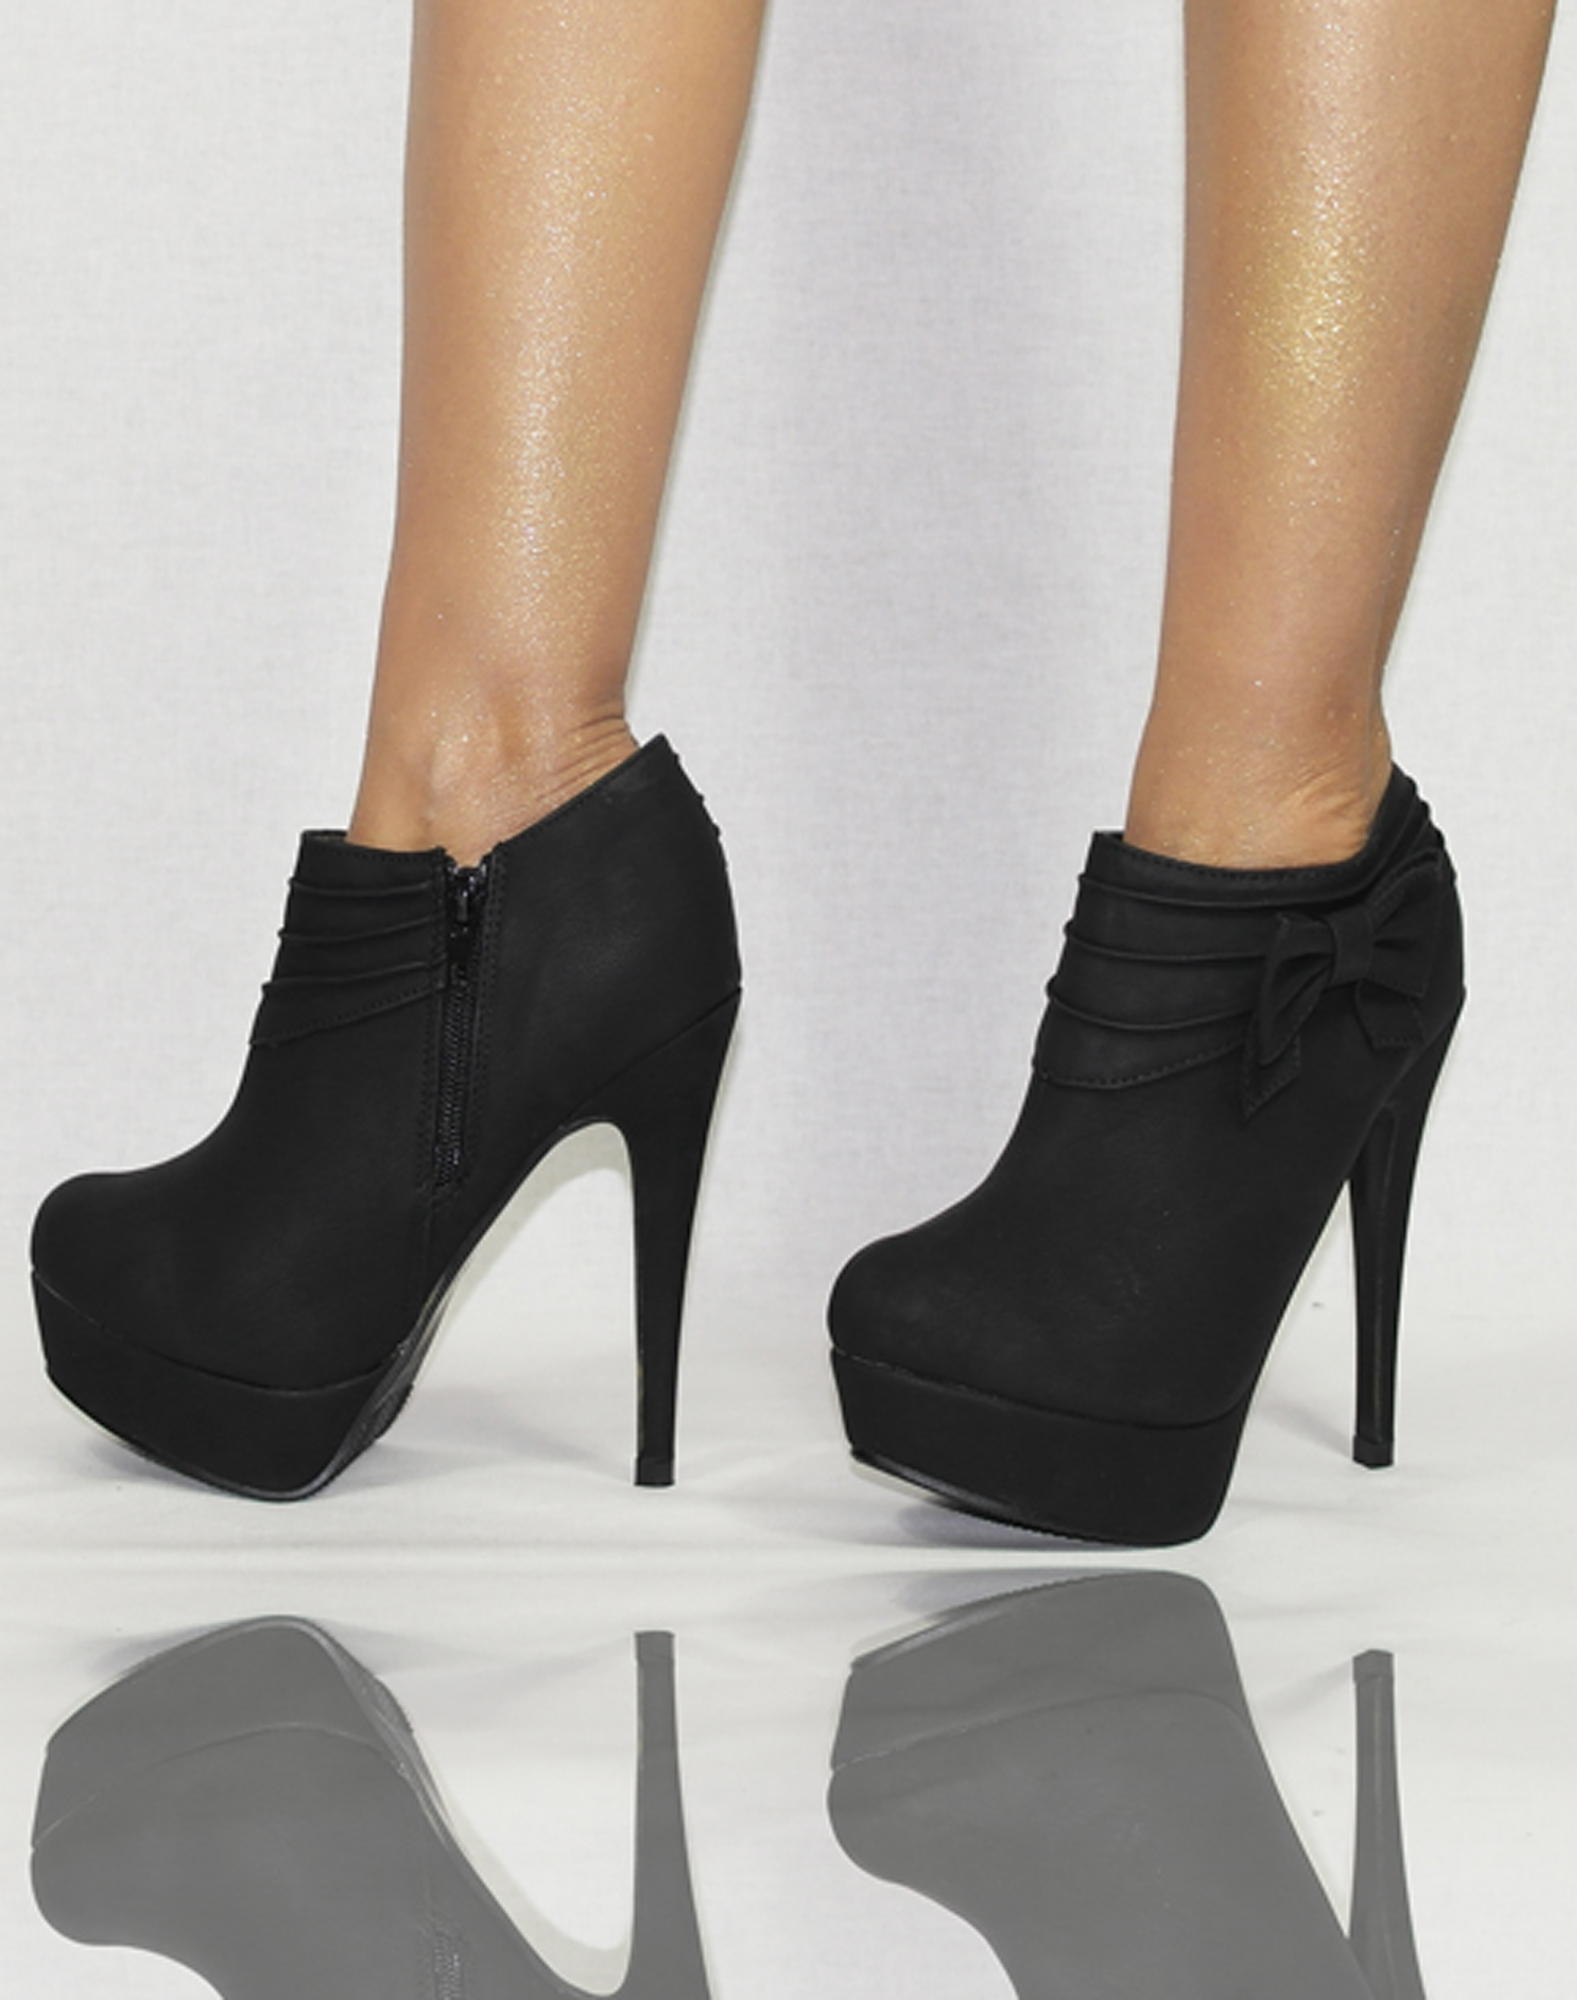 damenschuhe pumps schwarz rot braun gr n blau high heels. Black Bedroom Furniture Sets. Home Design Ideas